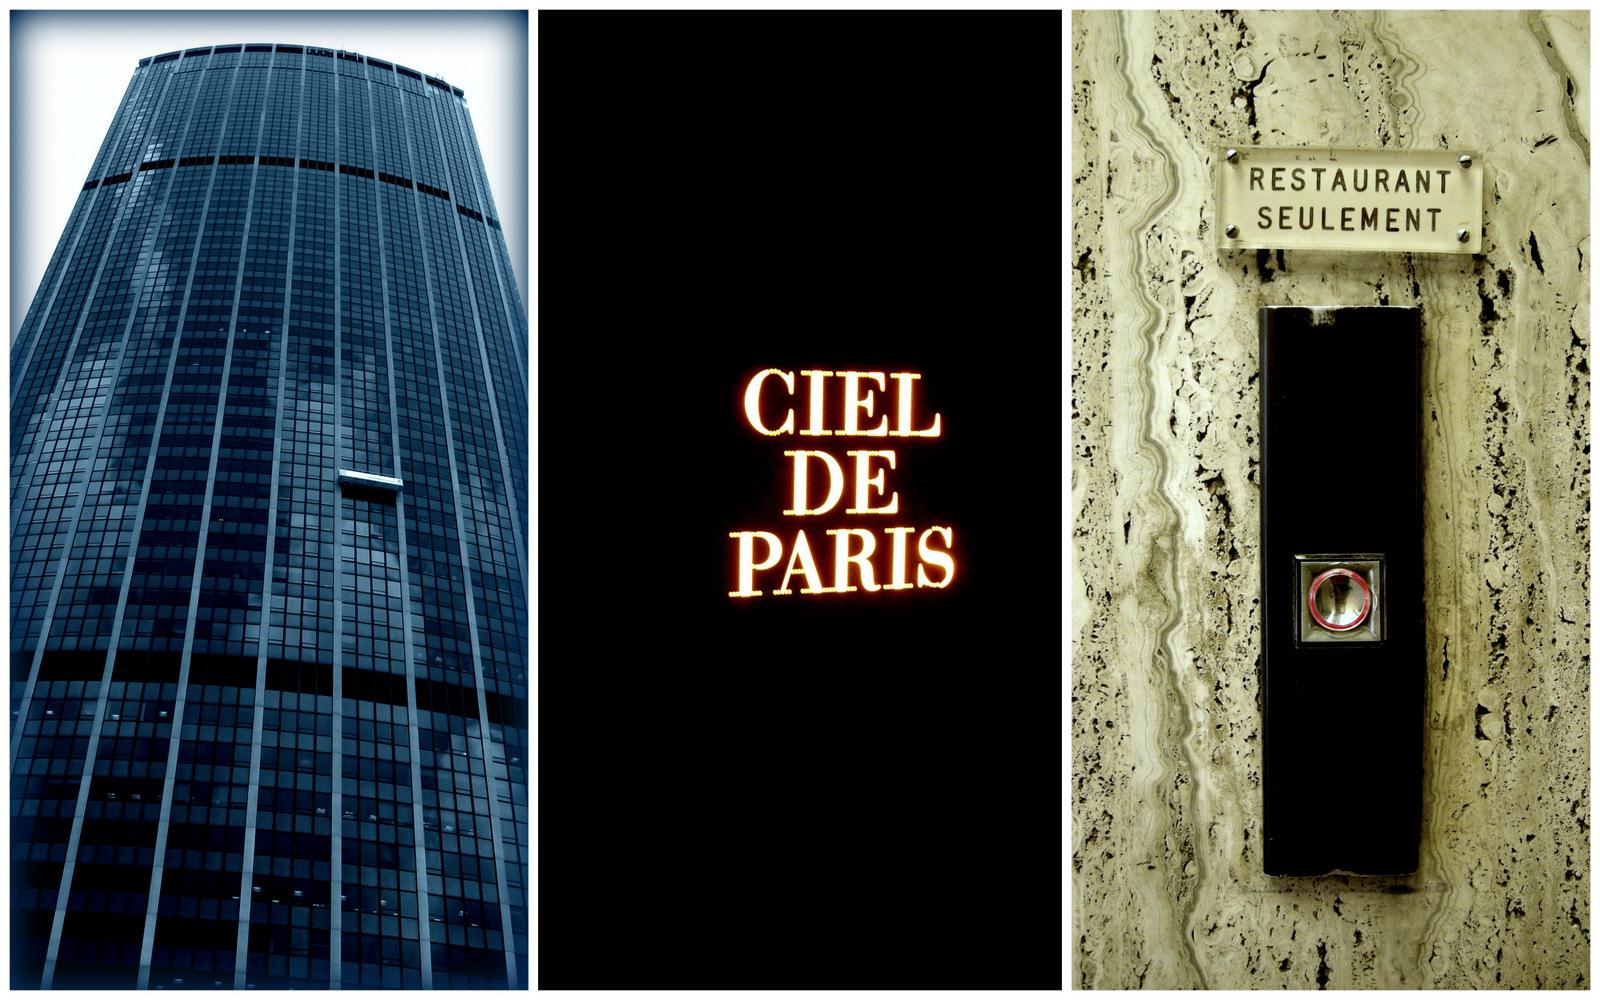 Restaurant Le Ciel De Paris  Ef Bf Bdme  Ef Bf Bdtage Tour Montparnasse